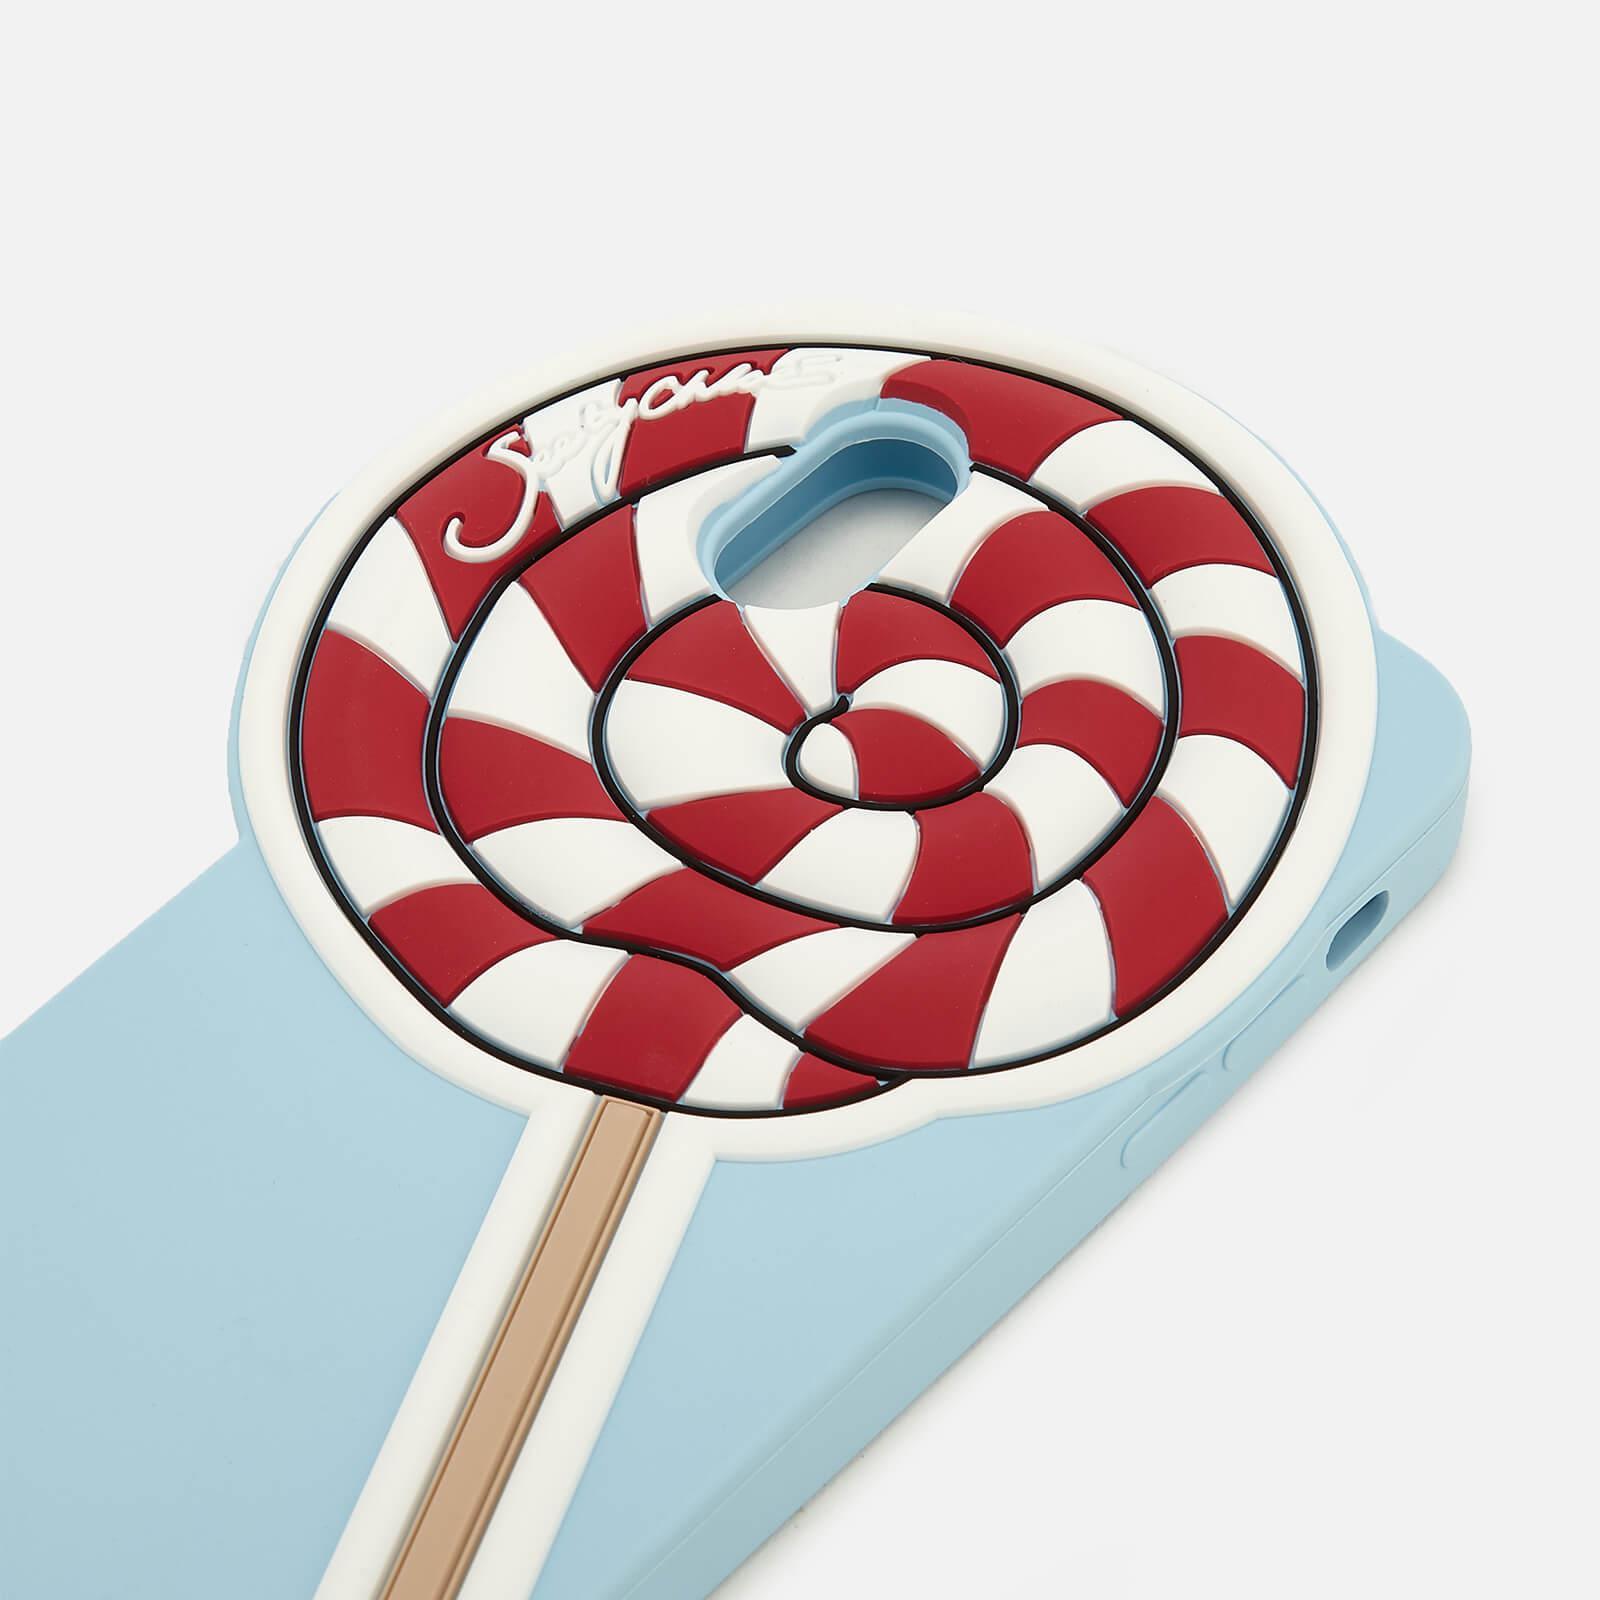 Lollipop and mindy deep